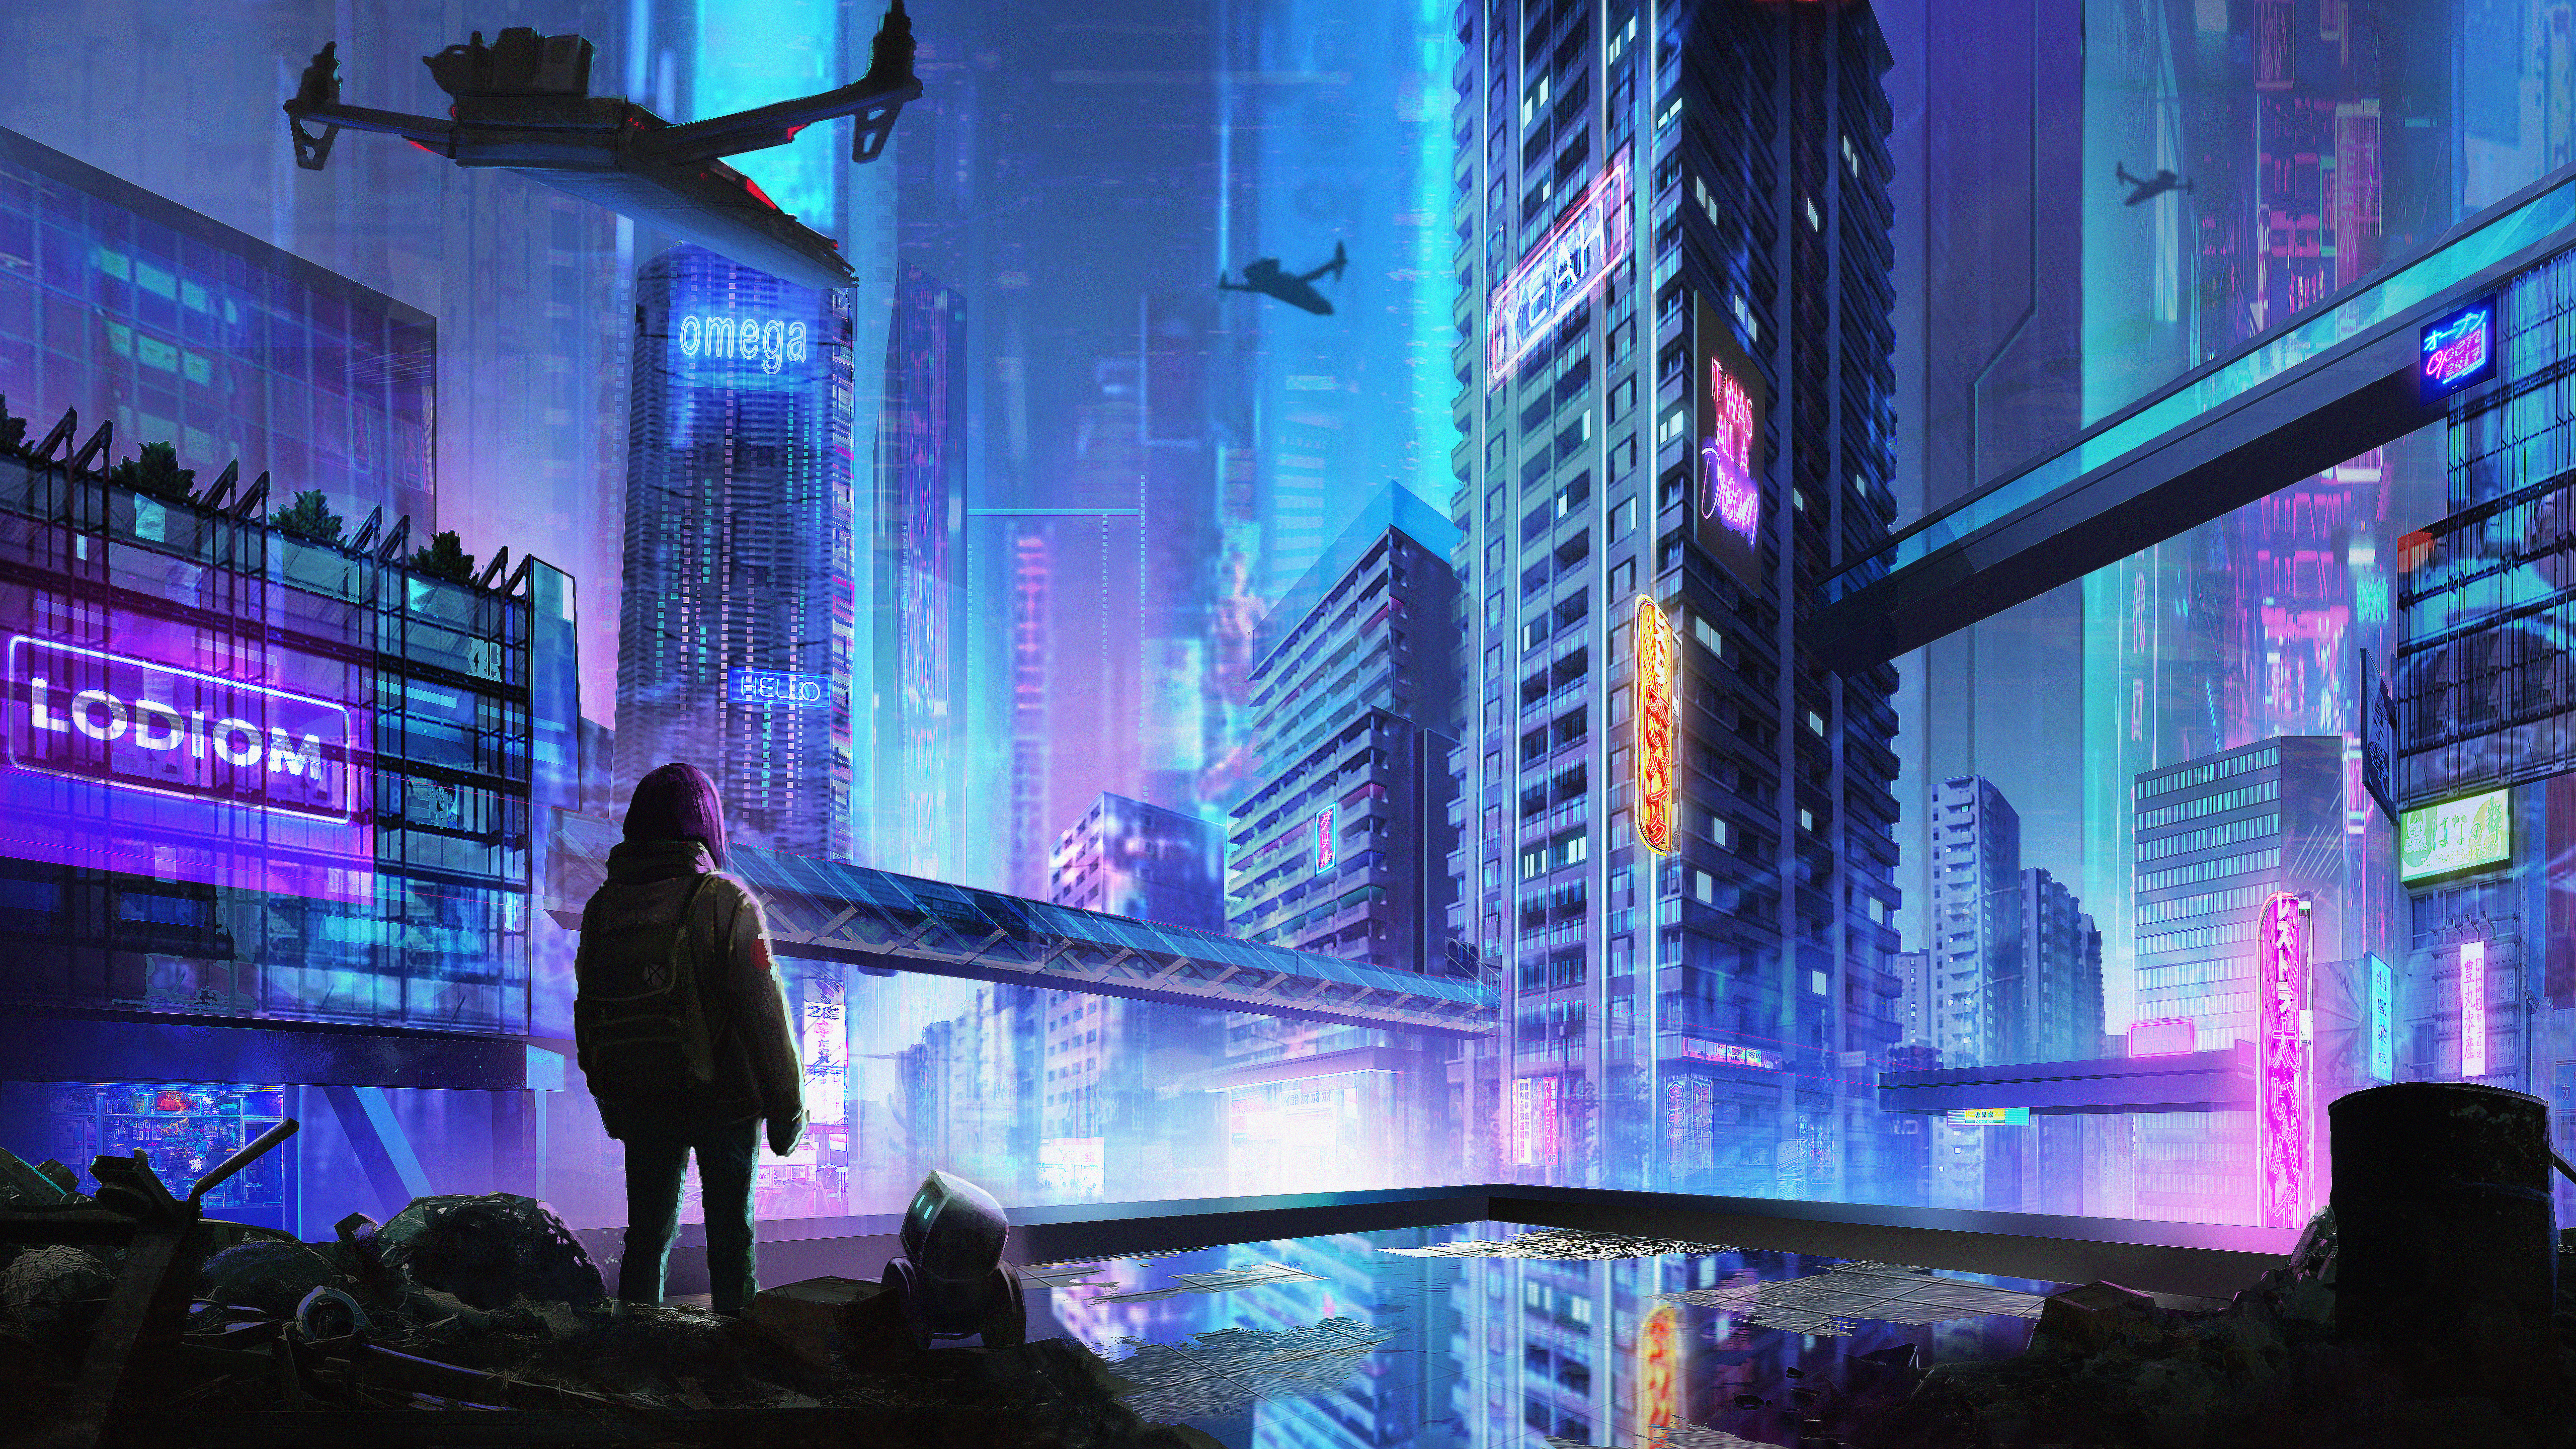 scavenger cityscape cyberpunk 1580055635 - Scavenger Cityscape Cyberpunk -